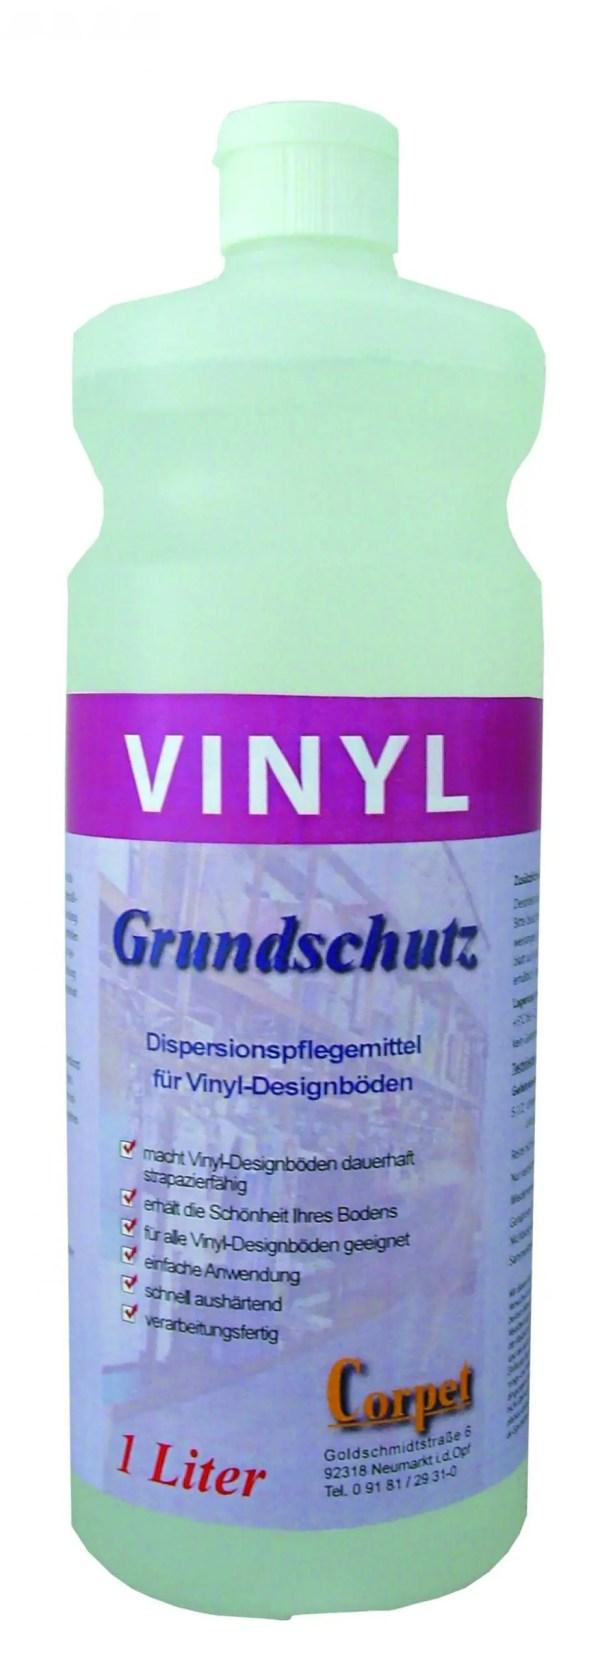 Corpet Vinyl Grundschutz Pflegemittel